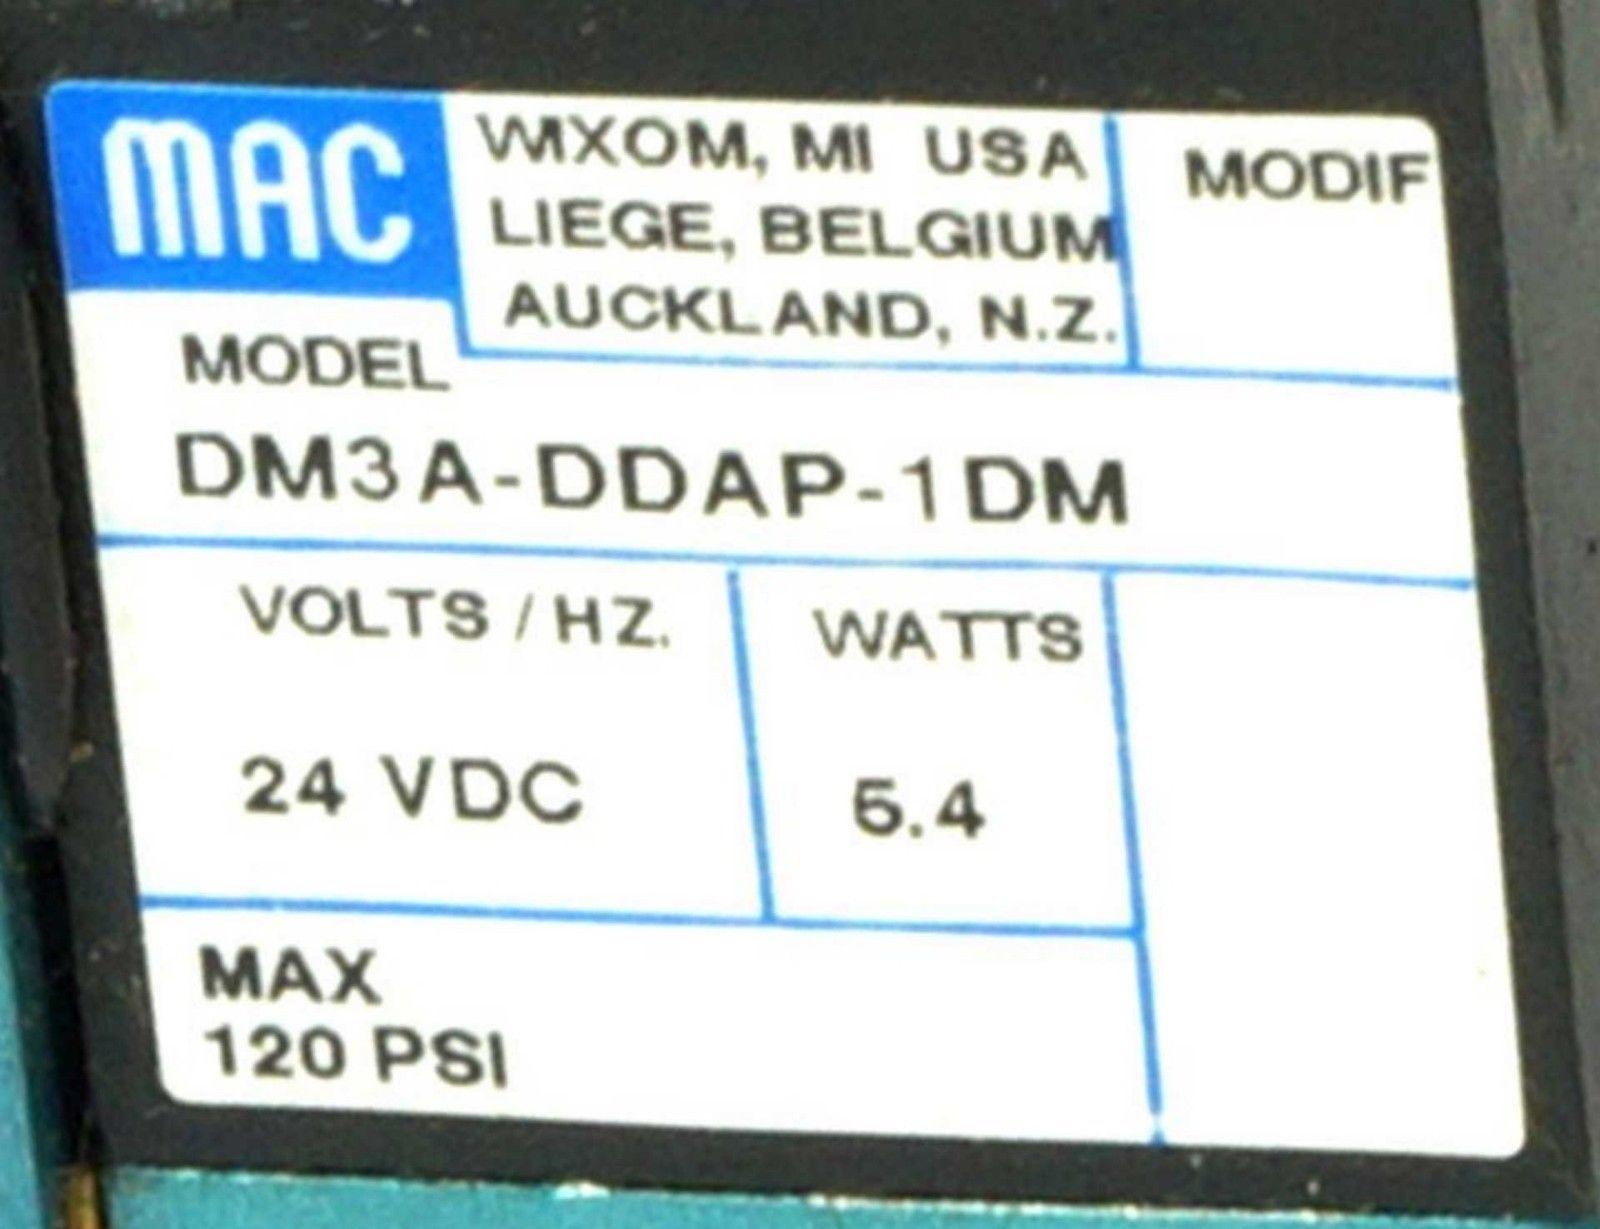 Wiring Valve Mac Diagram Solenoid Dm3addap1dm | Wiring Diagram on